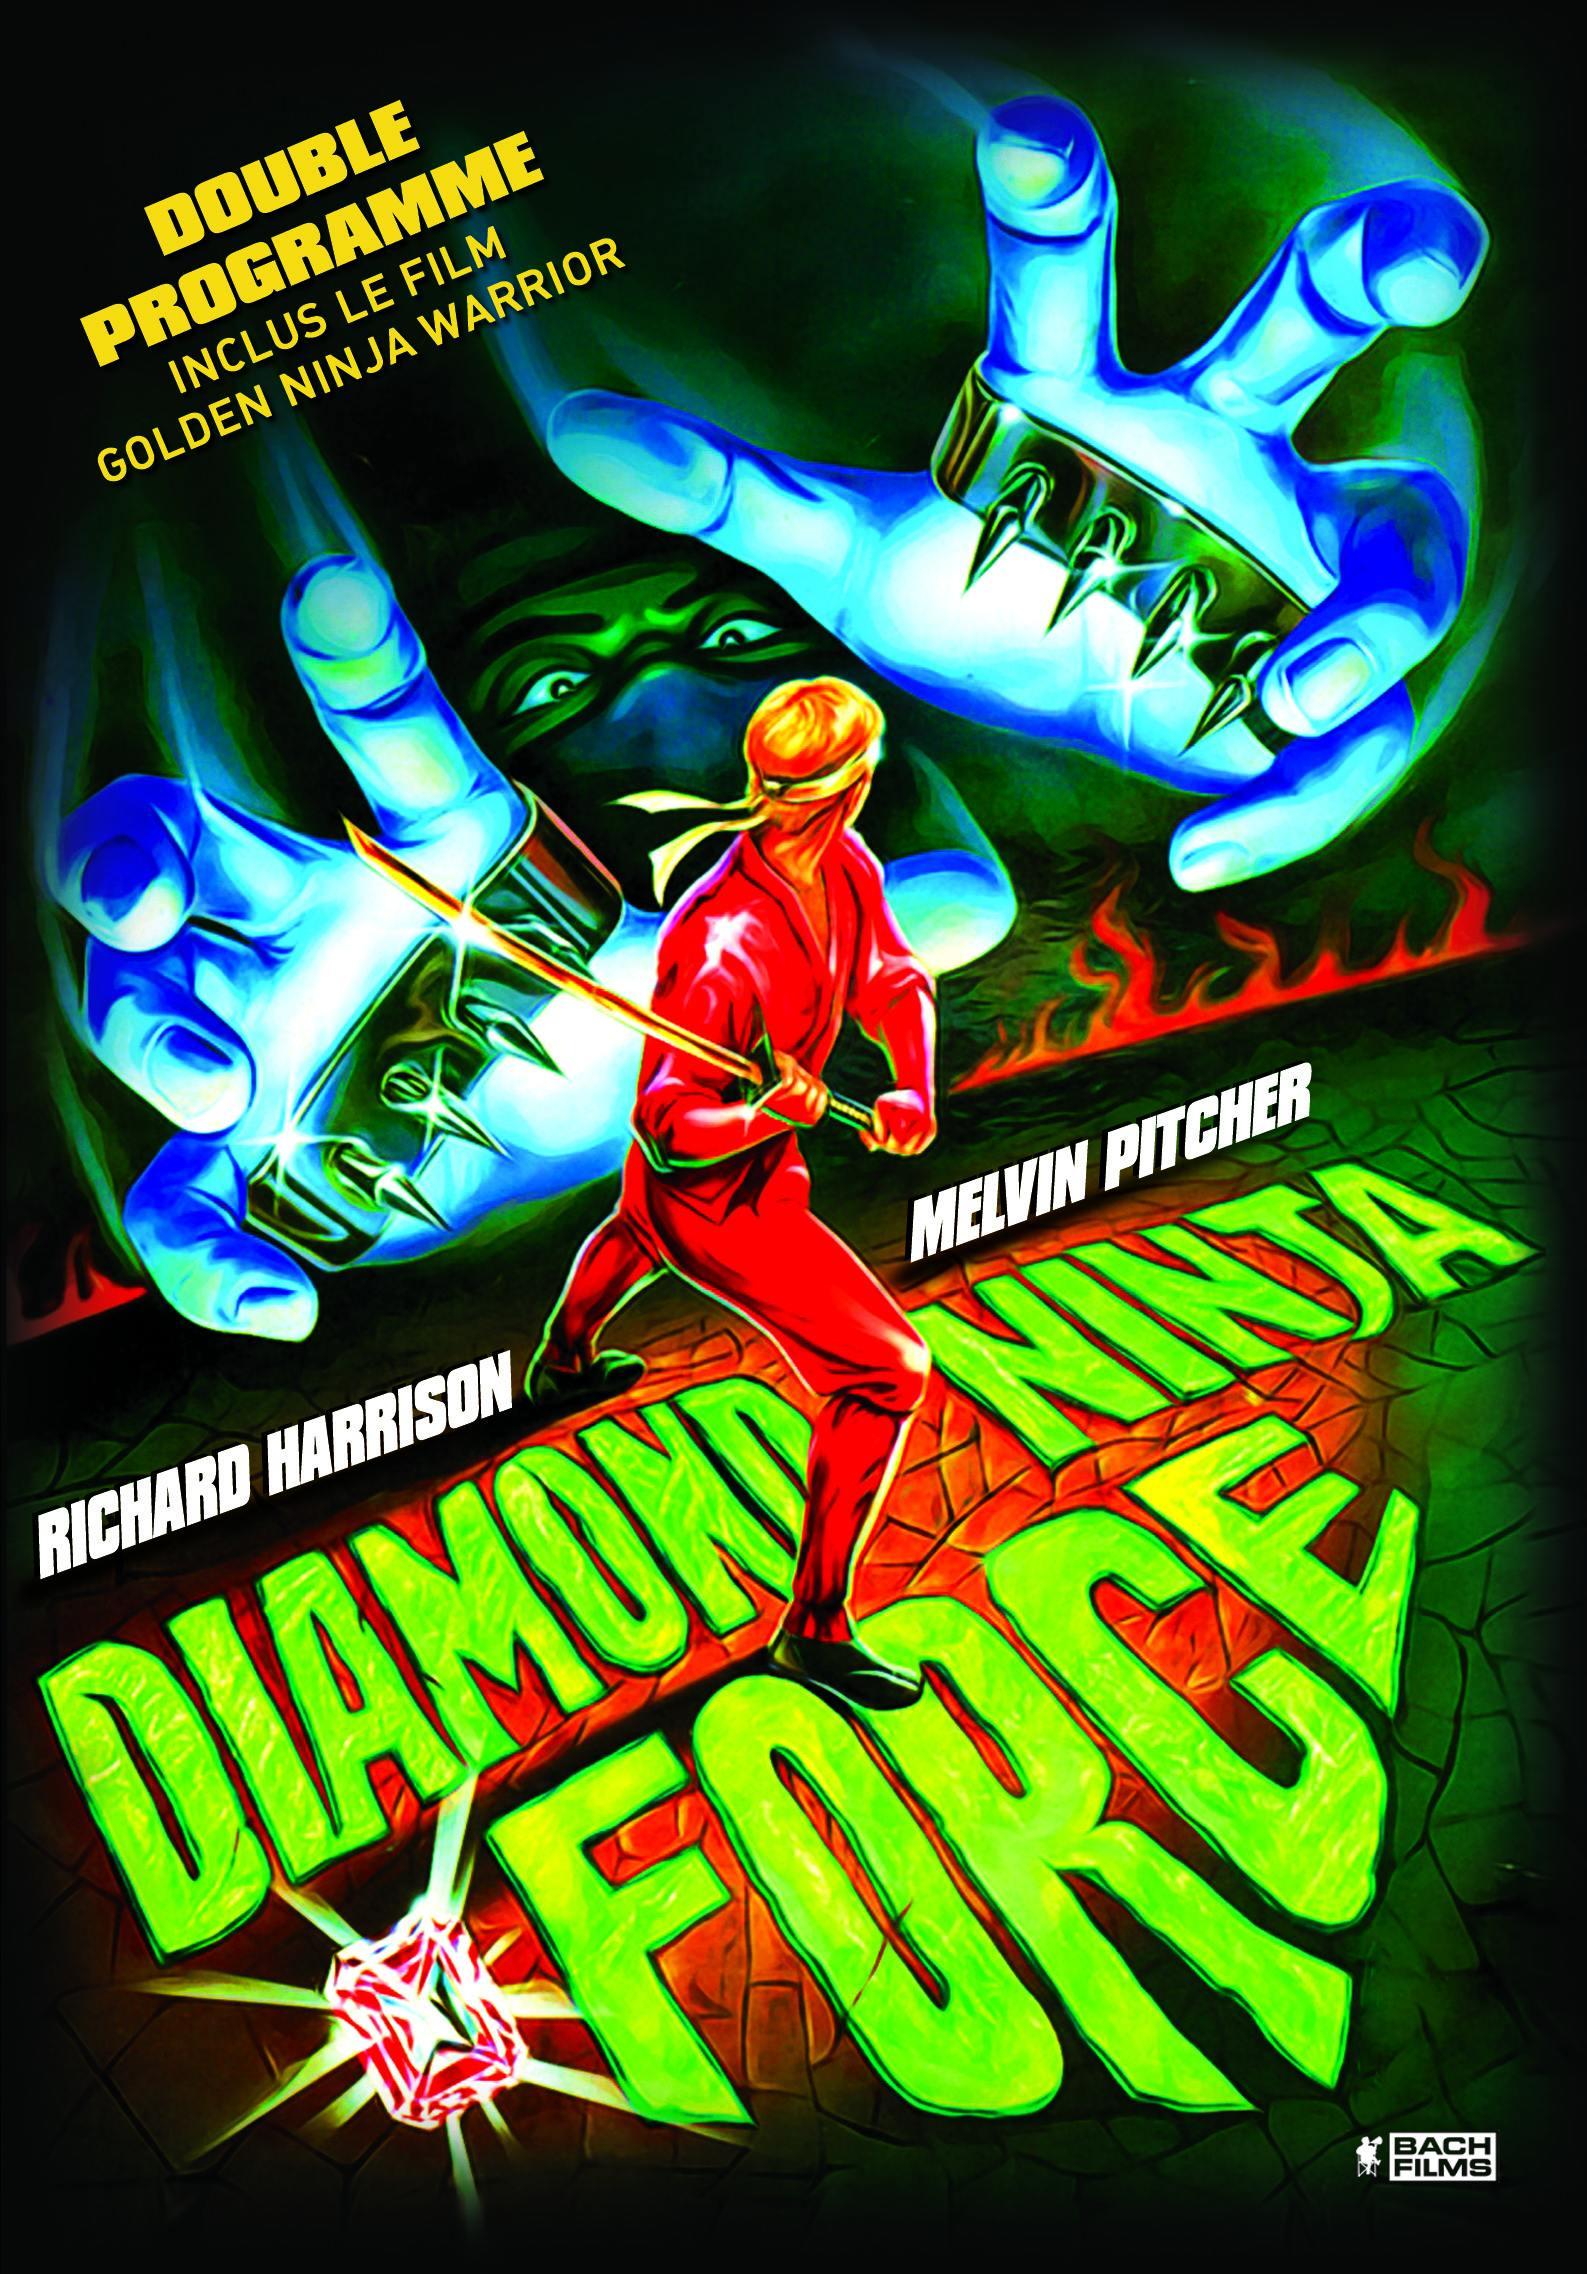 Diamond ninja force - dvd